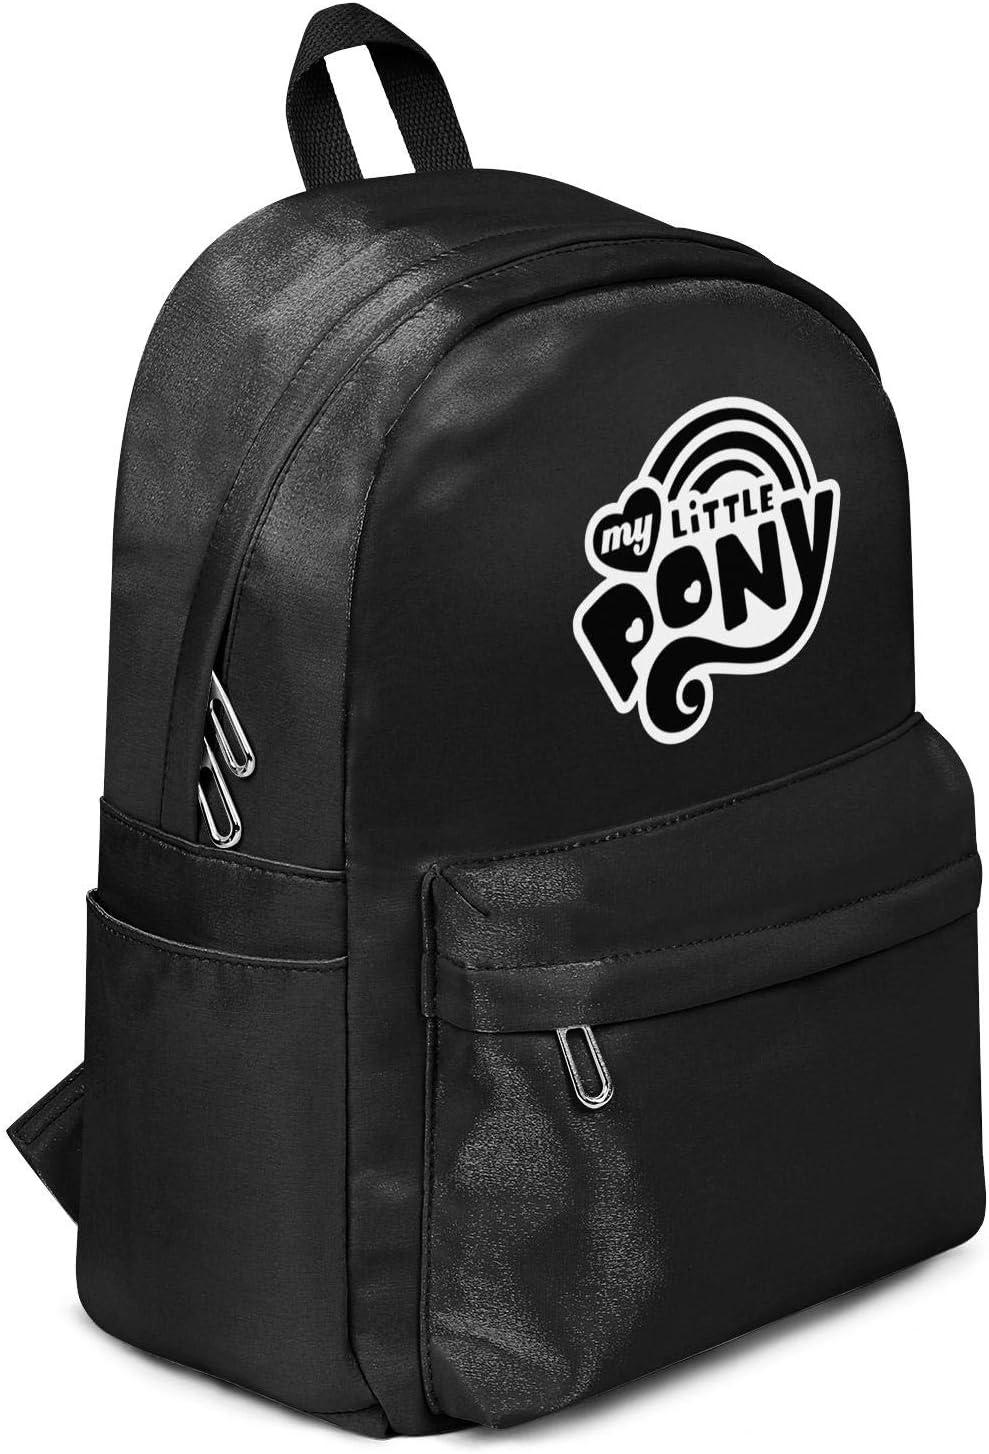 Unisex Backpack//Waterproof Backpack Ultralight Little-Pony-weekend Get-away Laptop Backpack for Everyday